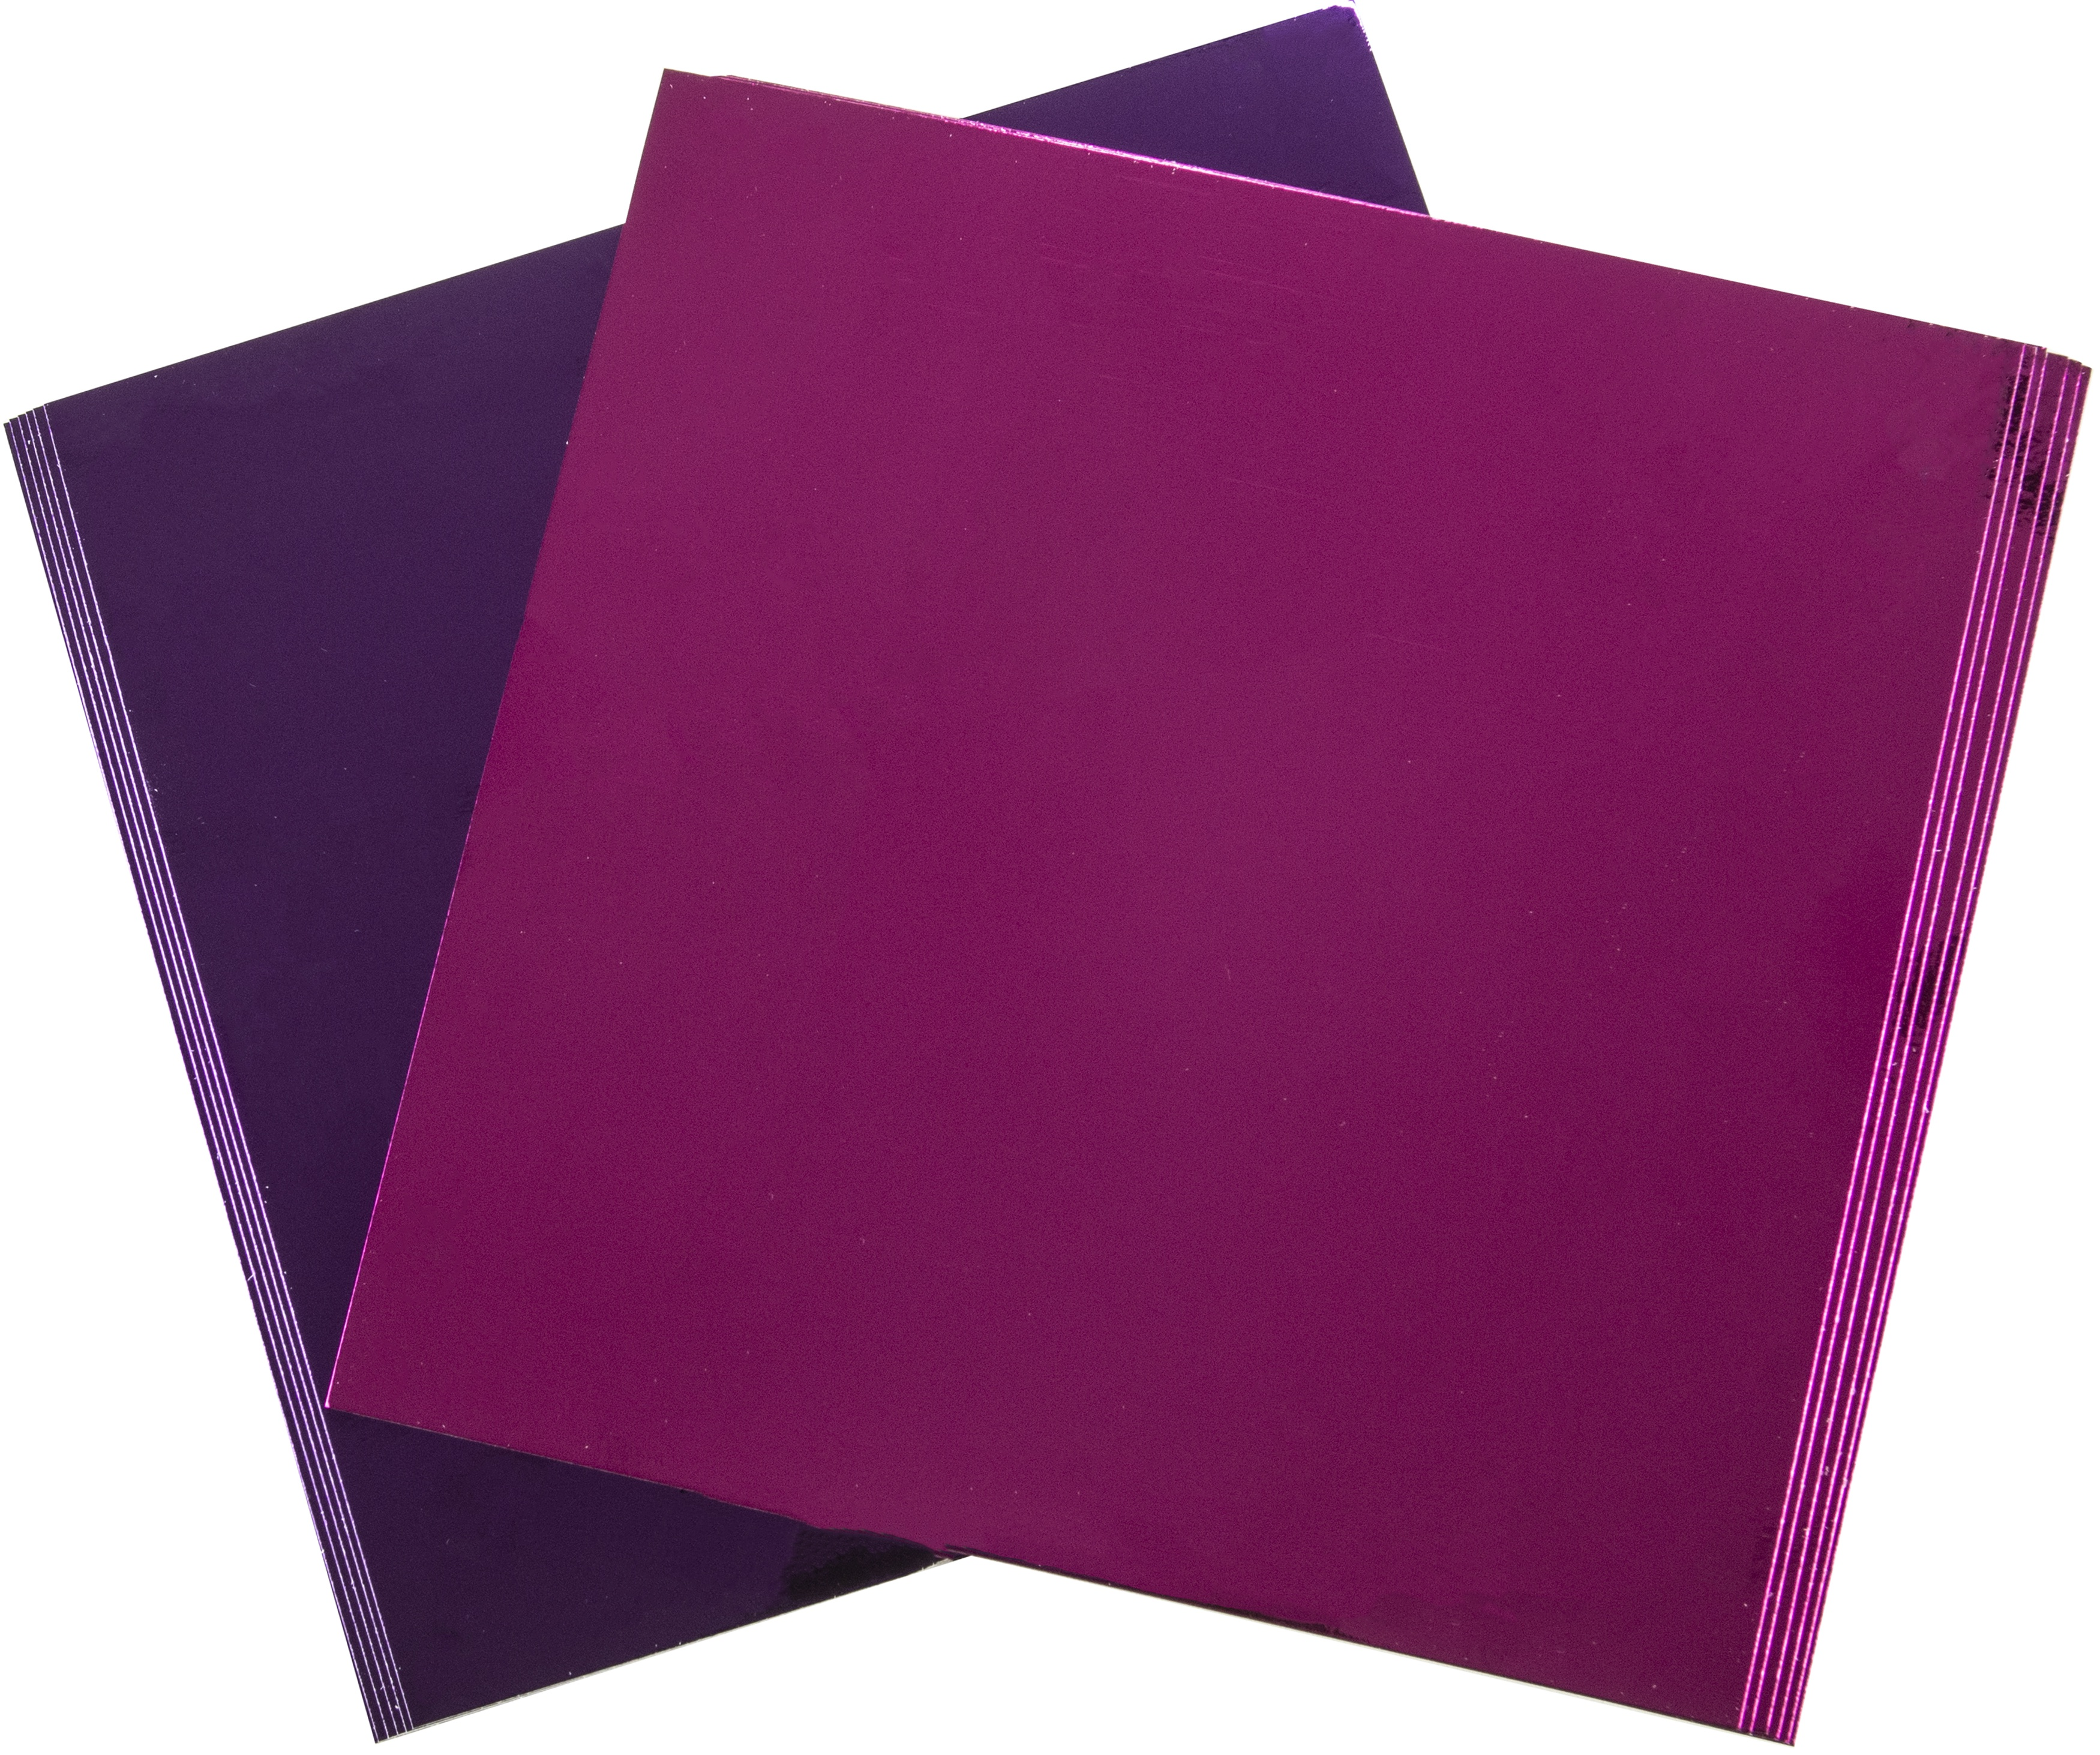 Concord & 9th Foil Paper Pack 6X6 12 Sheets-Flirty Foil